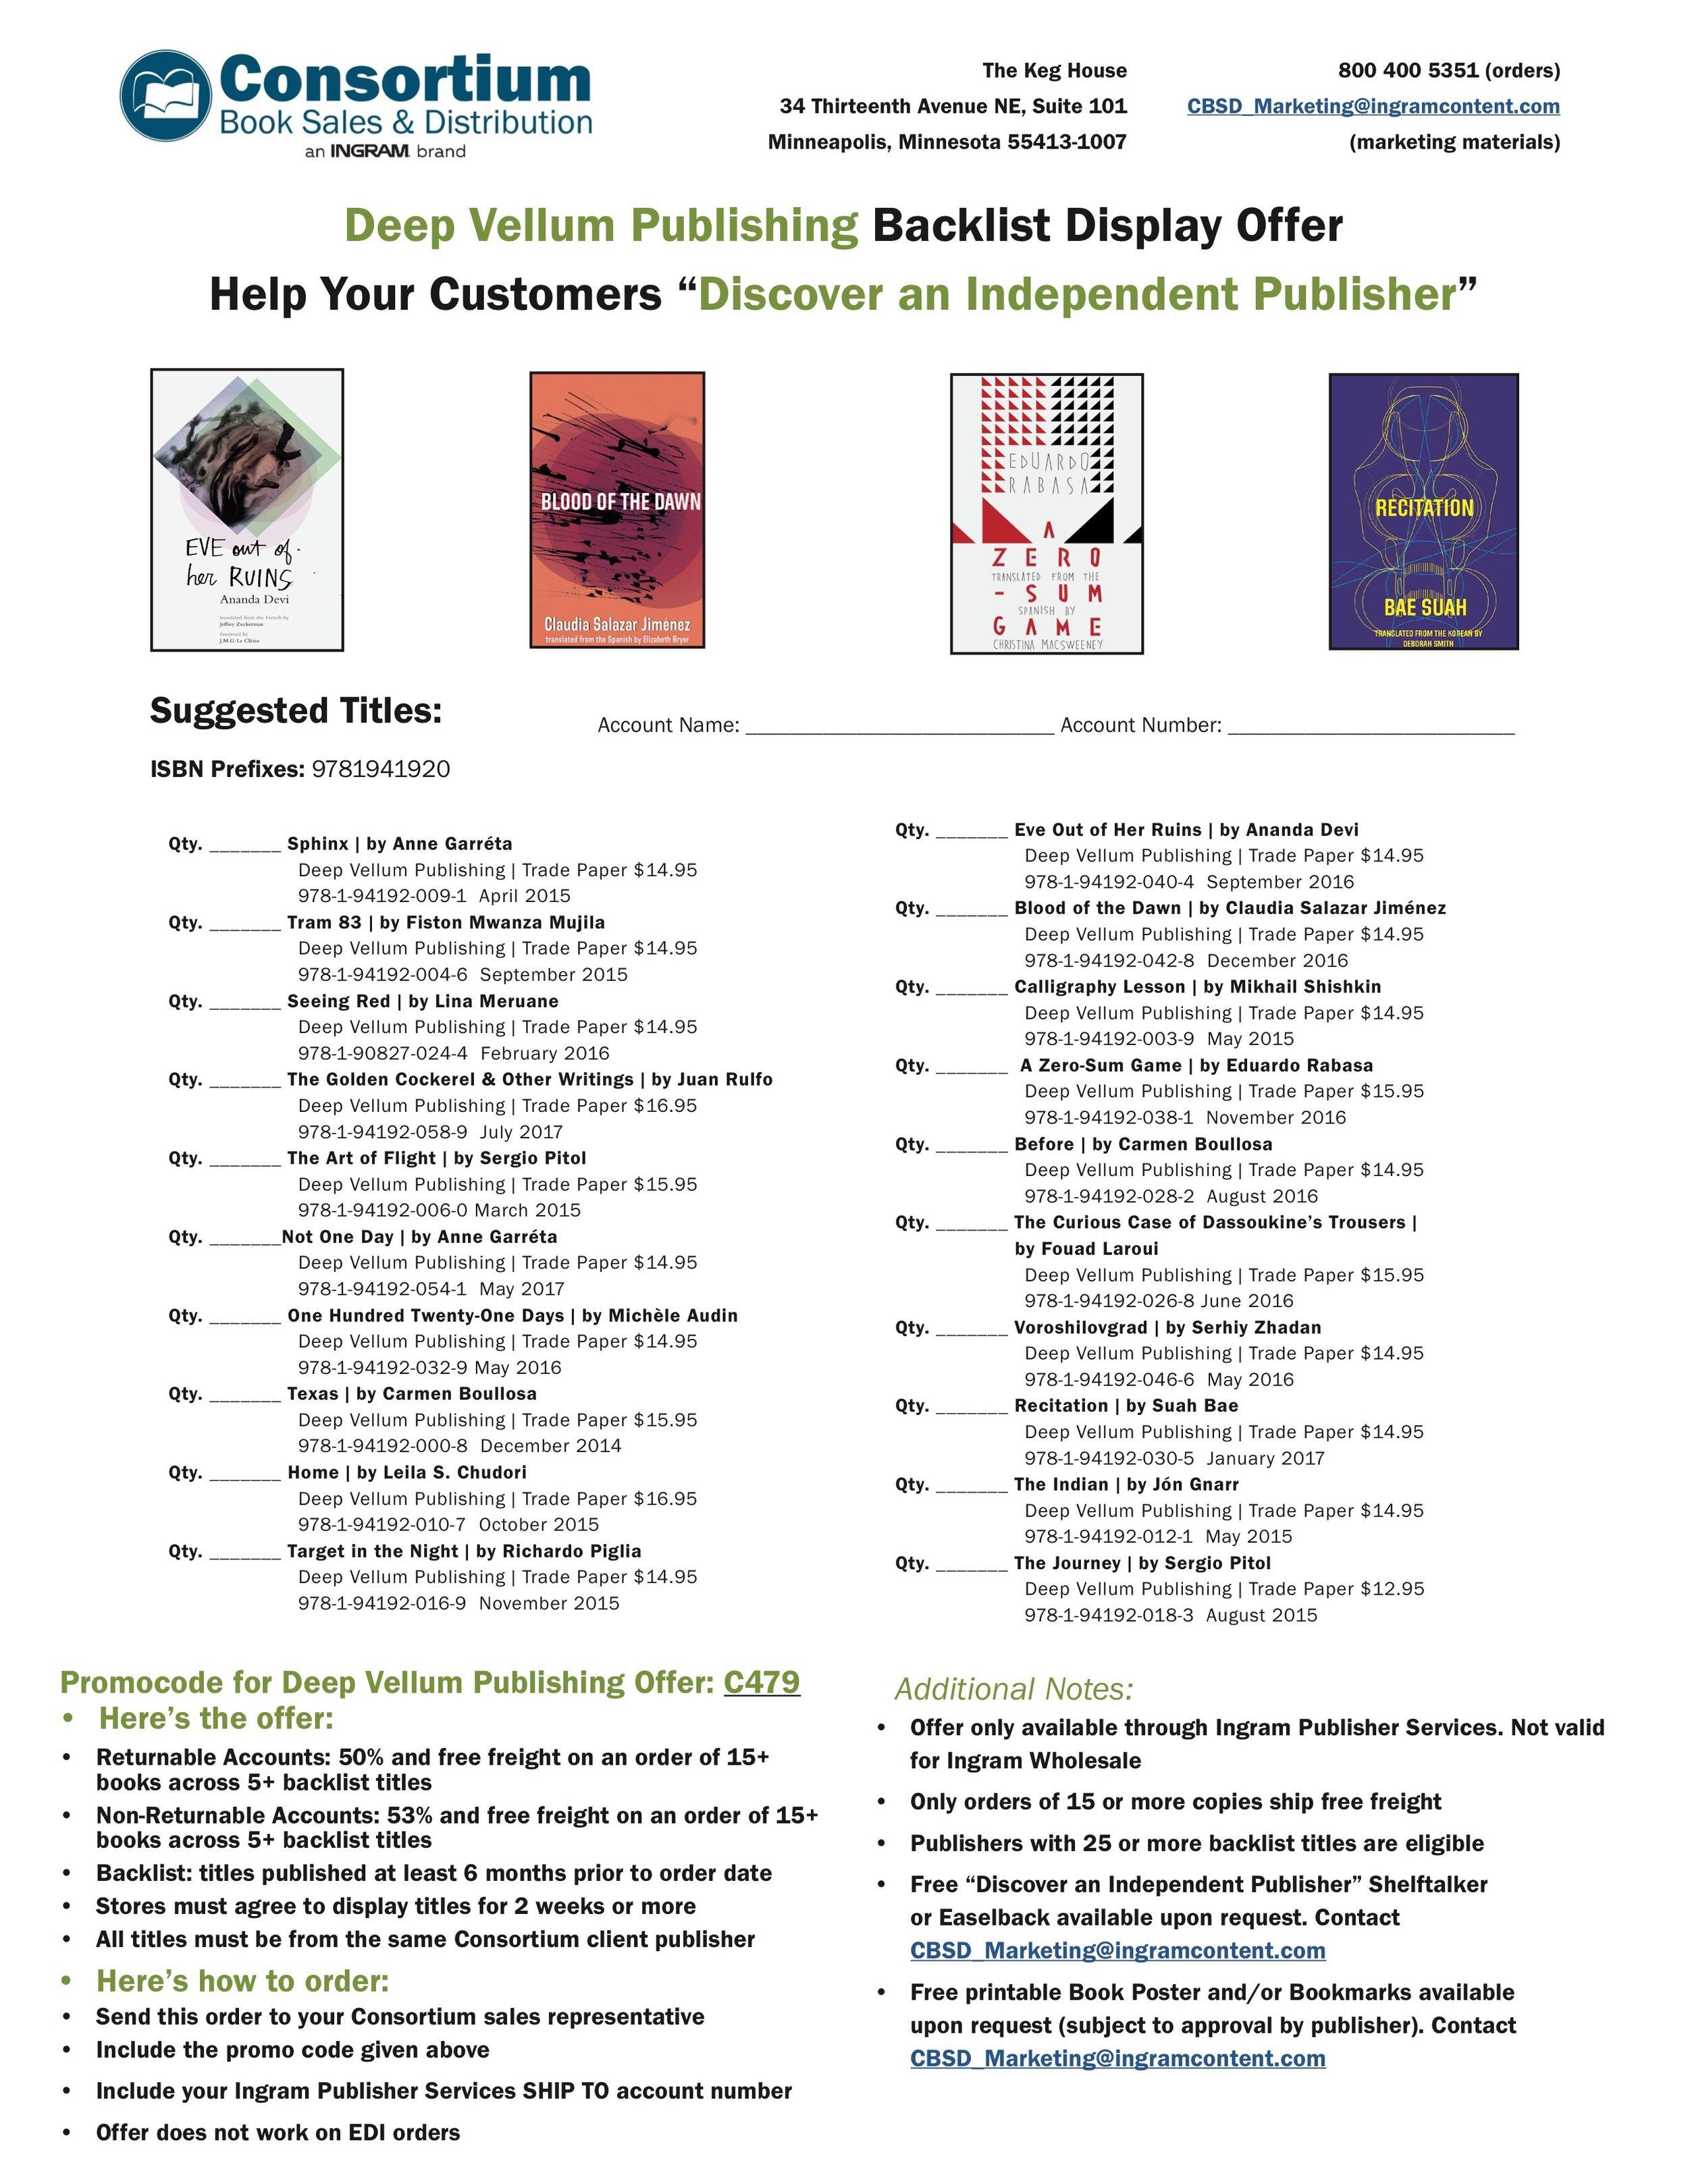 Deep Vellum Publishing